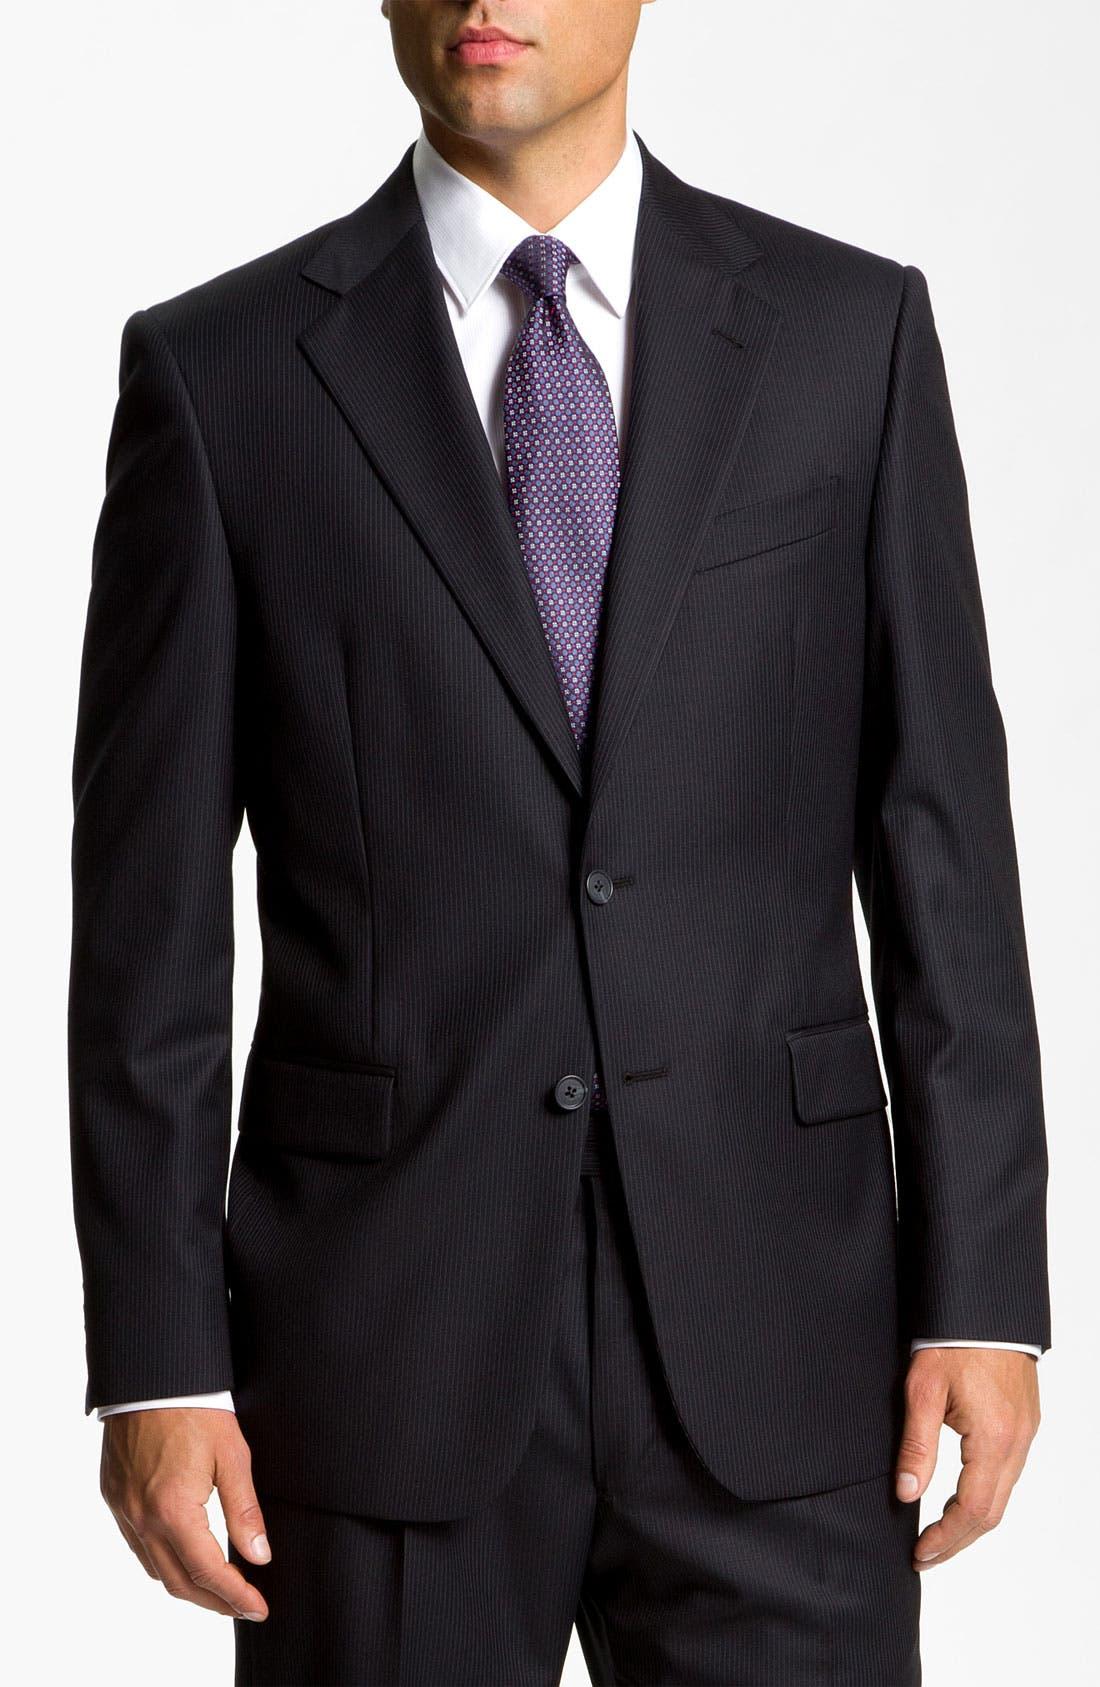 Main Image - Joseph Abboud 'Signature Silver' Pinstripe Suit